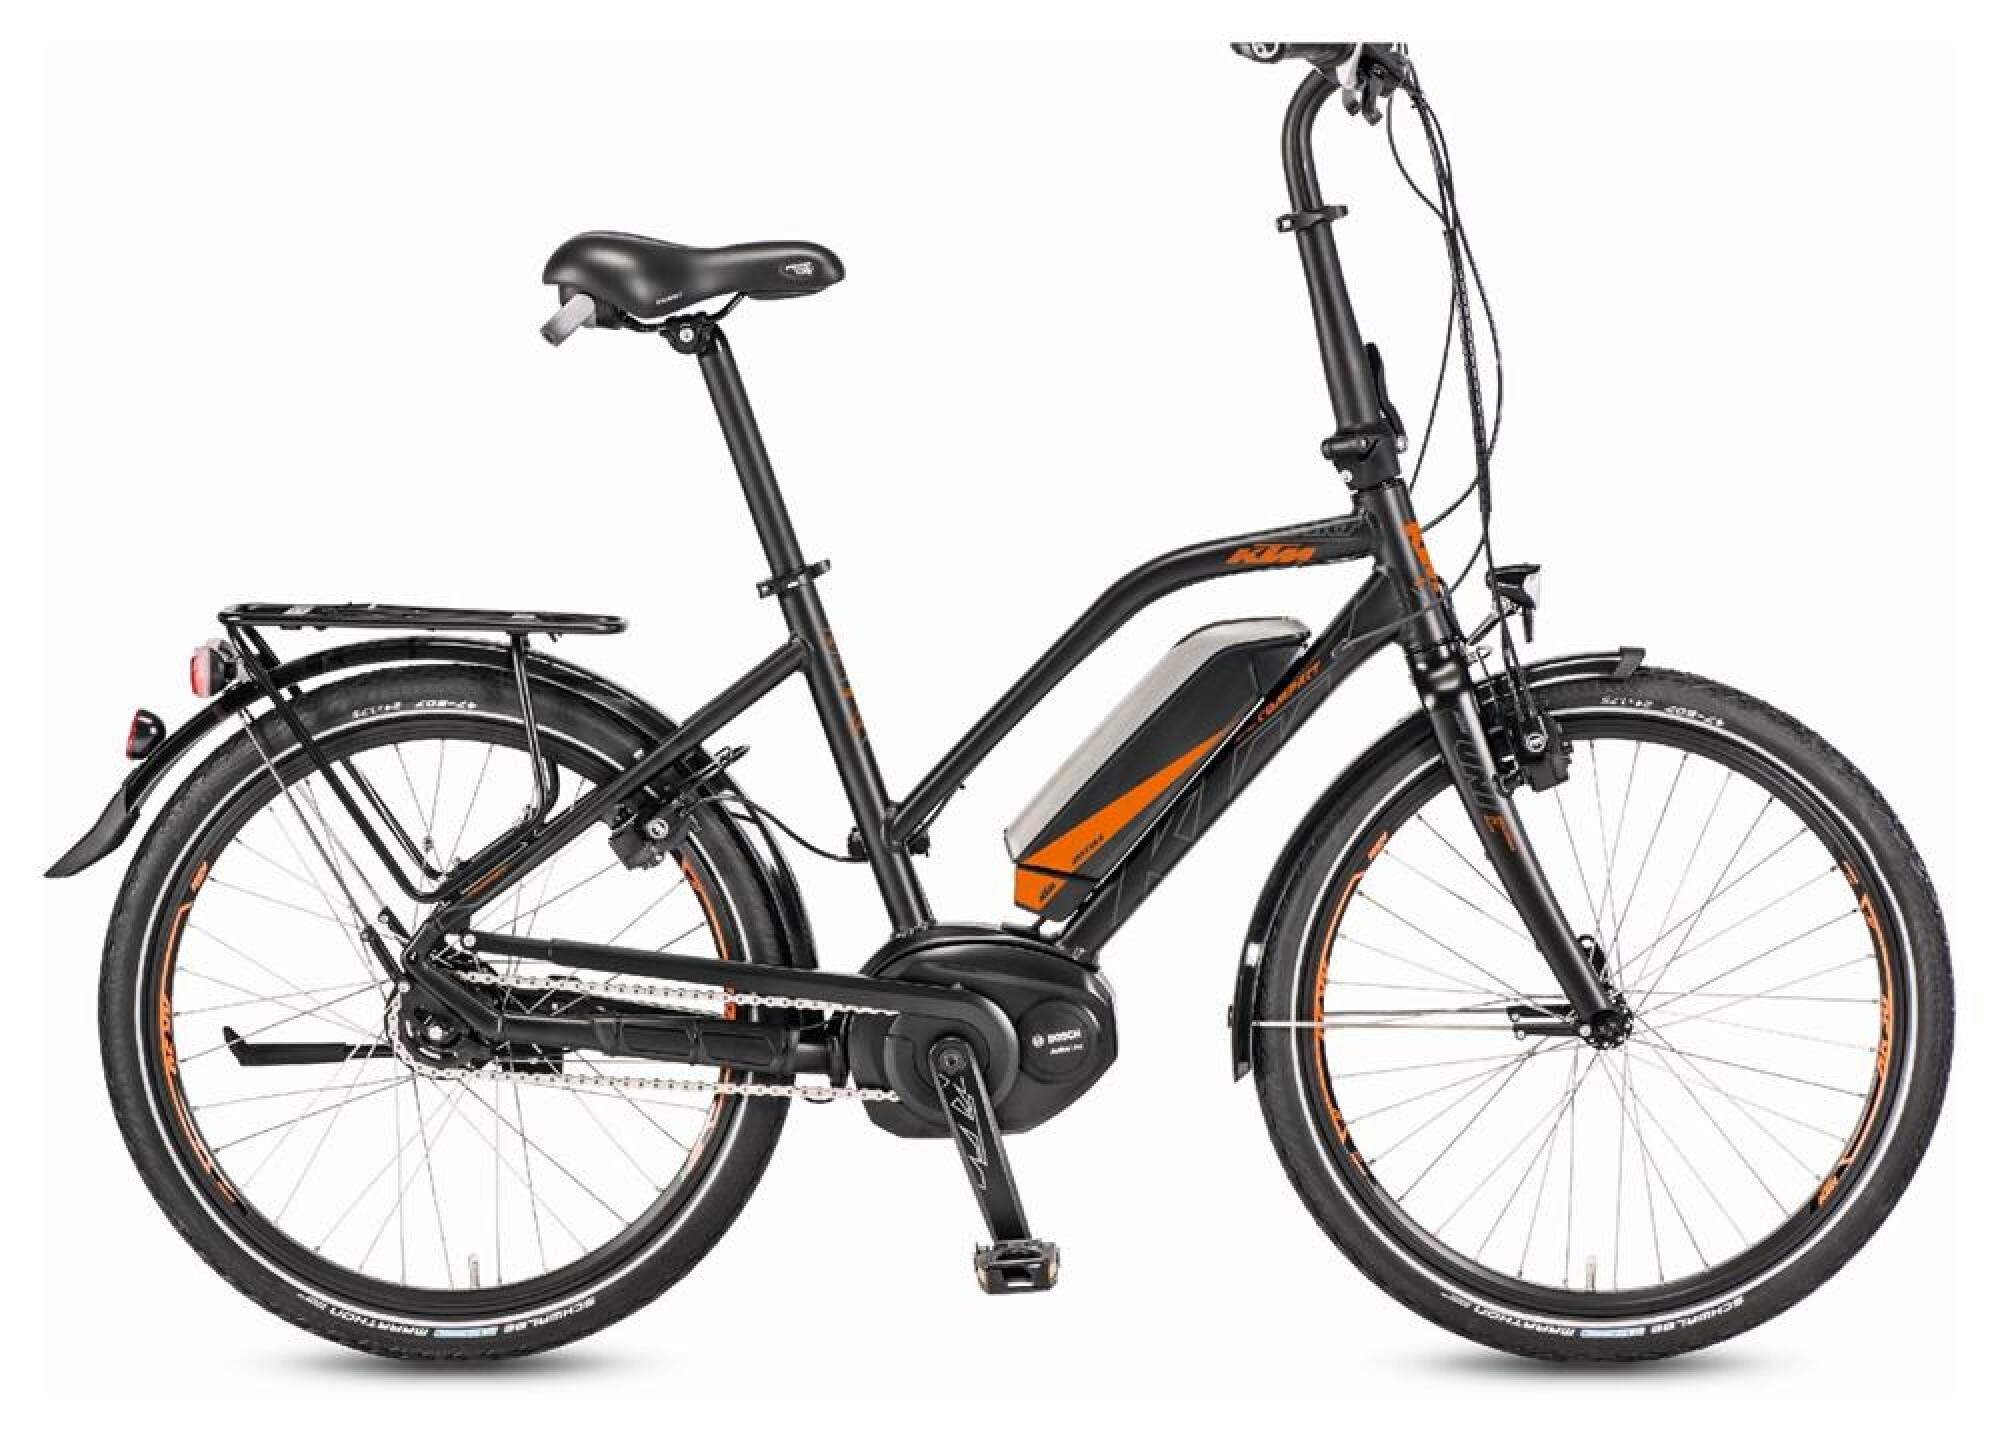 e bike ktm macina compact 24 compact 8 2017 bei onbikex. Black Bedroom Furniture Sets. Home Design Ideas